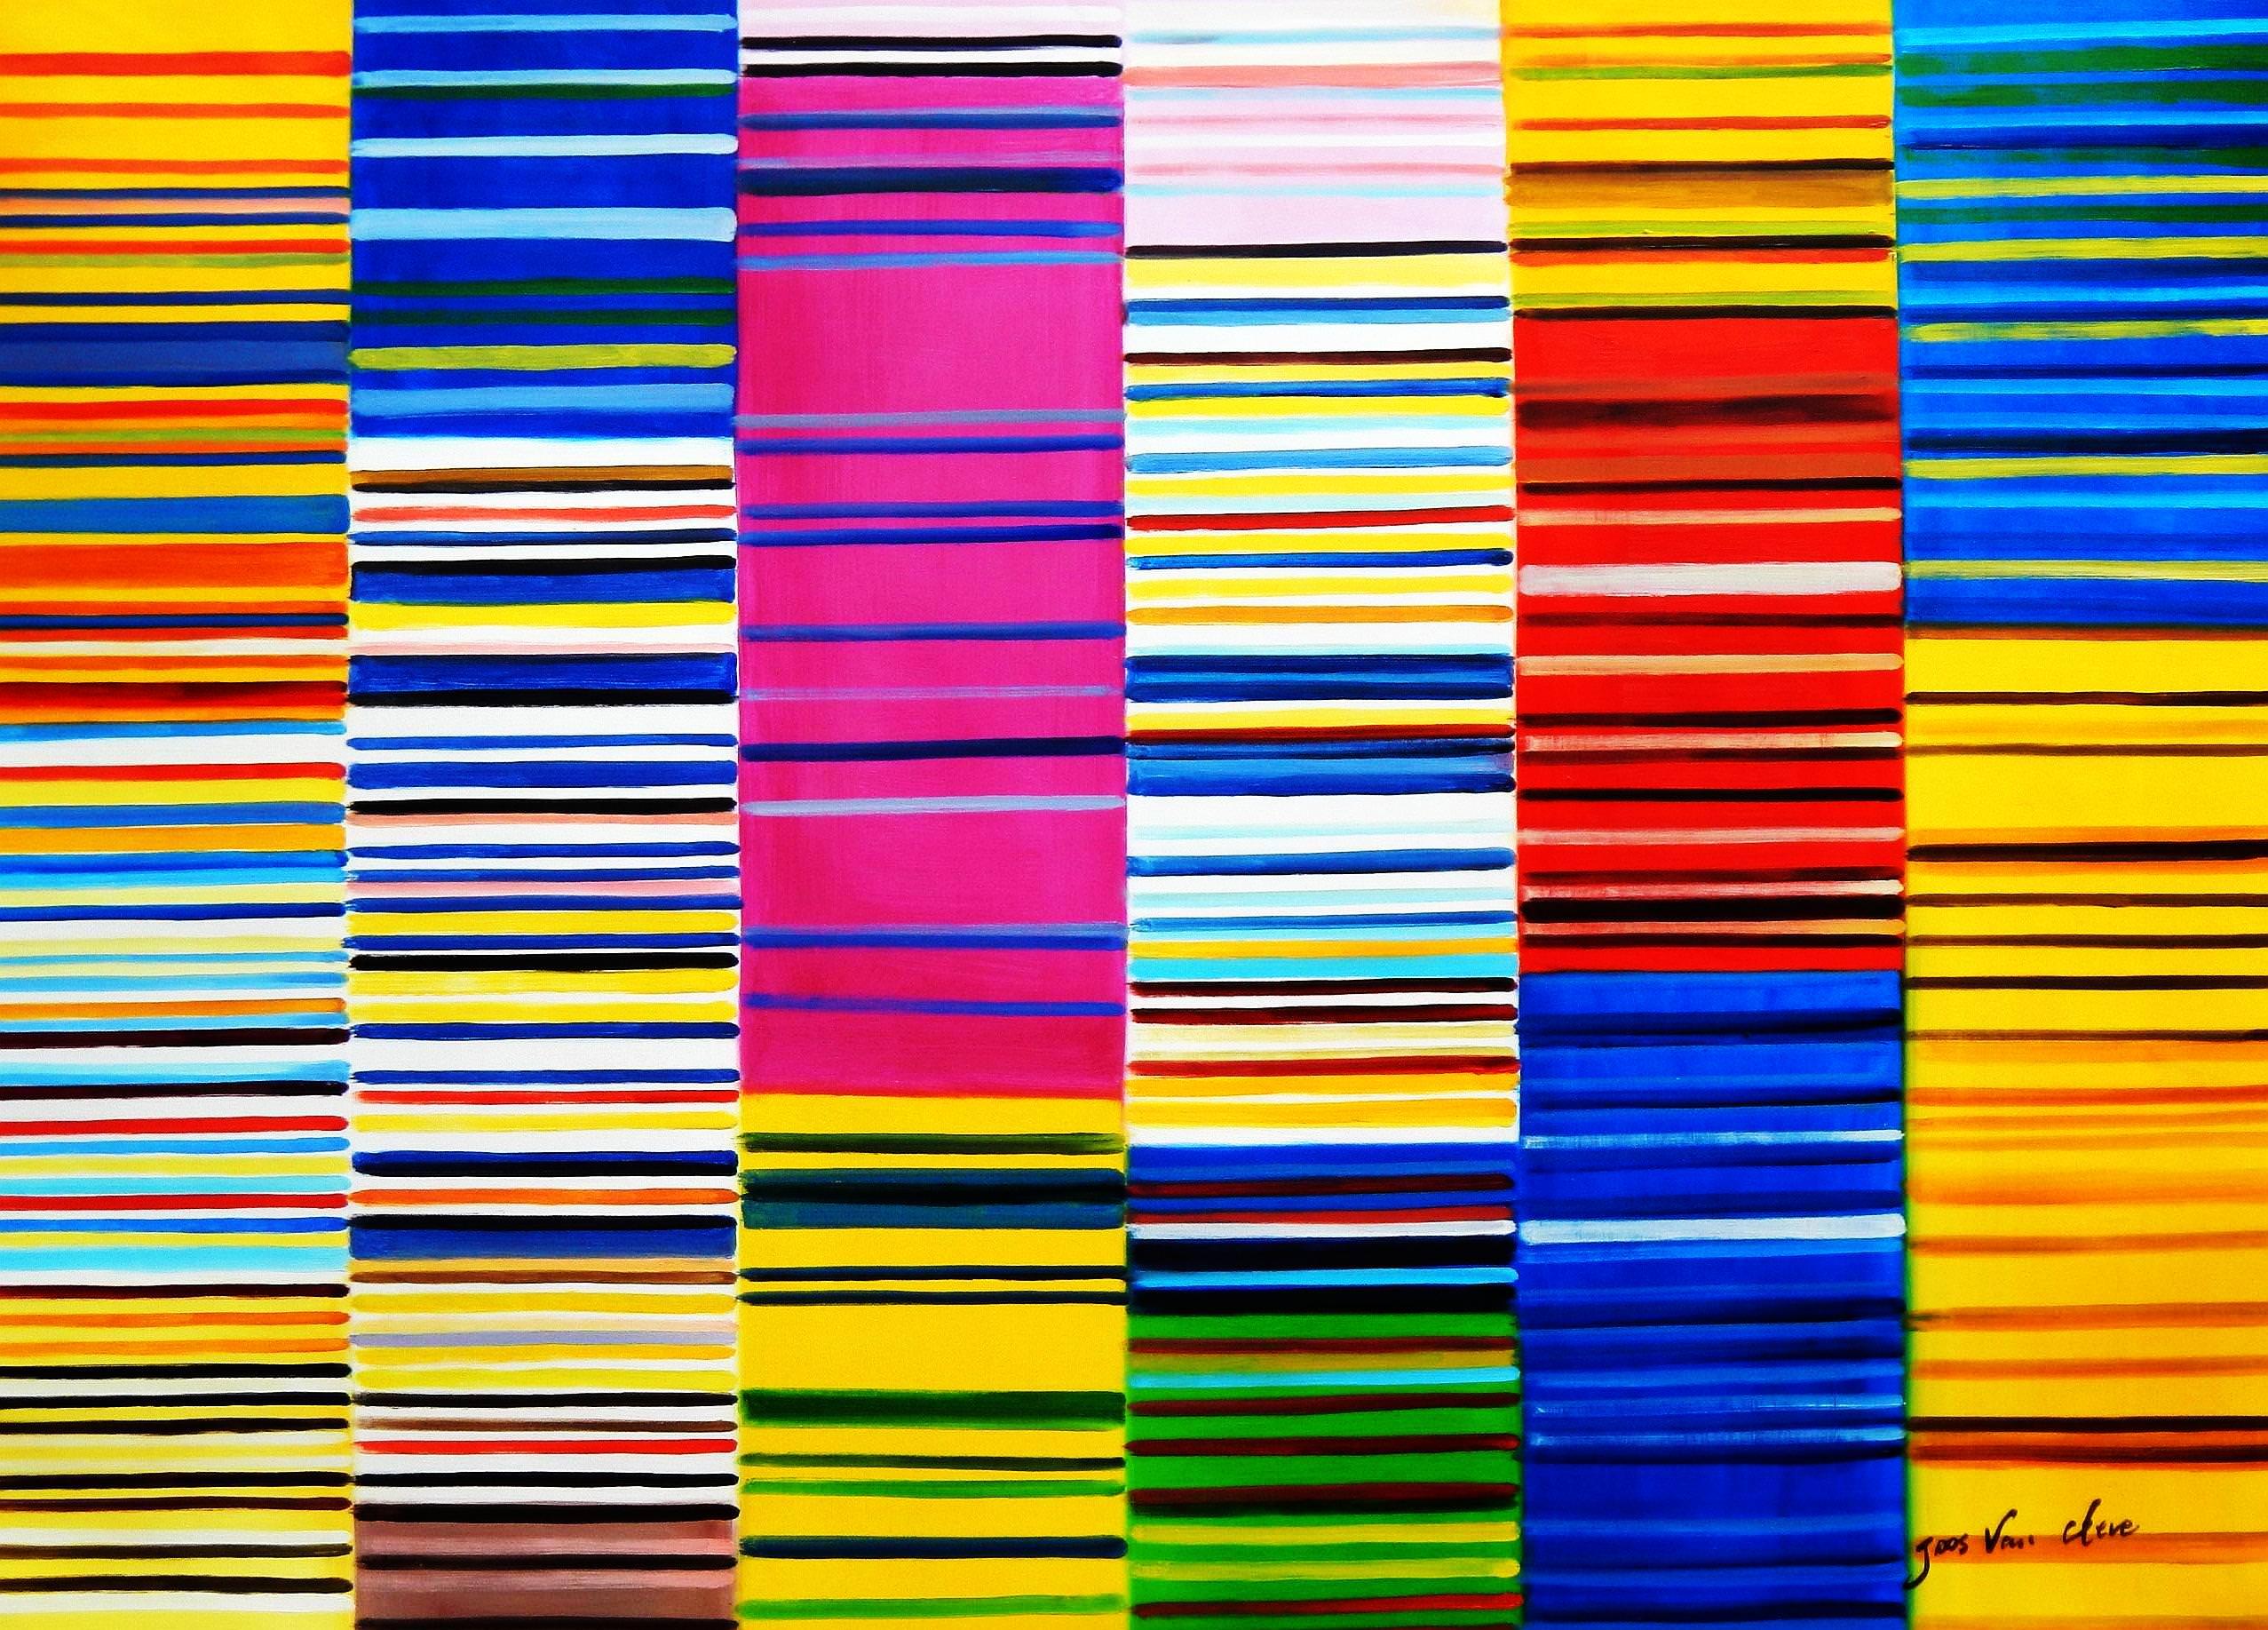 Modern Art - Lorenz stripes homage of Paul Smith i93130 80x110cm Ölgemälde